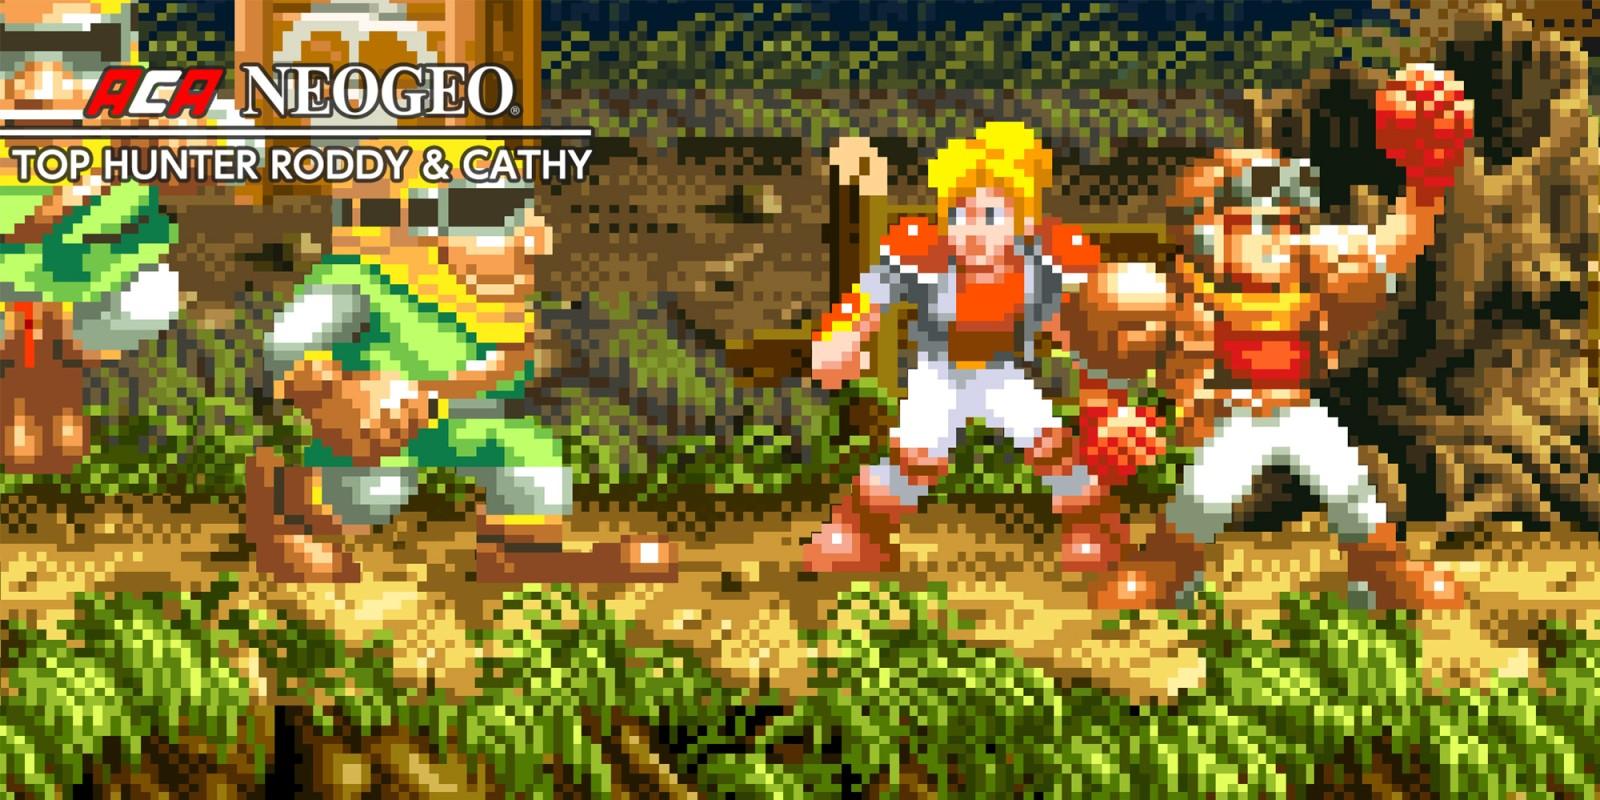 ACA NEOGEO TOP HUNTER RODDY & CATHY | Nintendo Switch